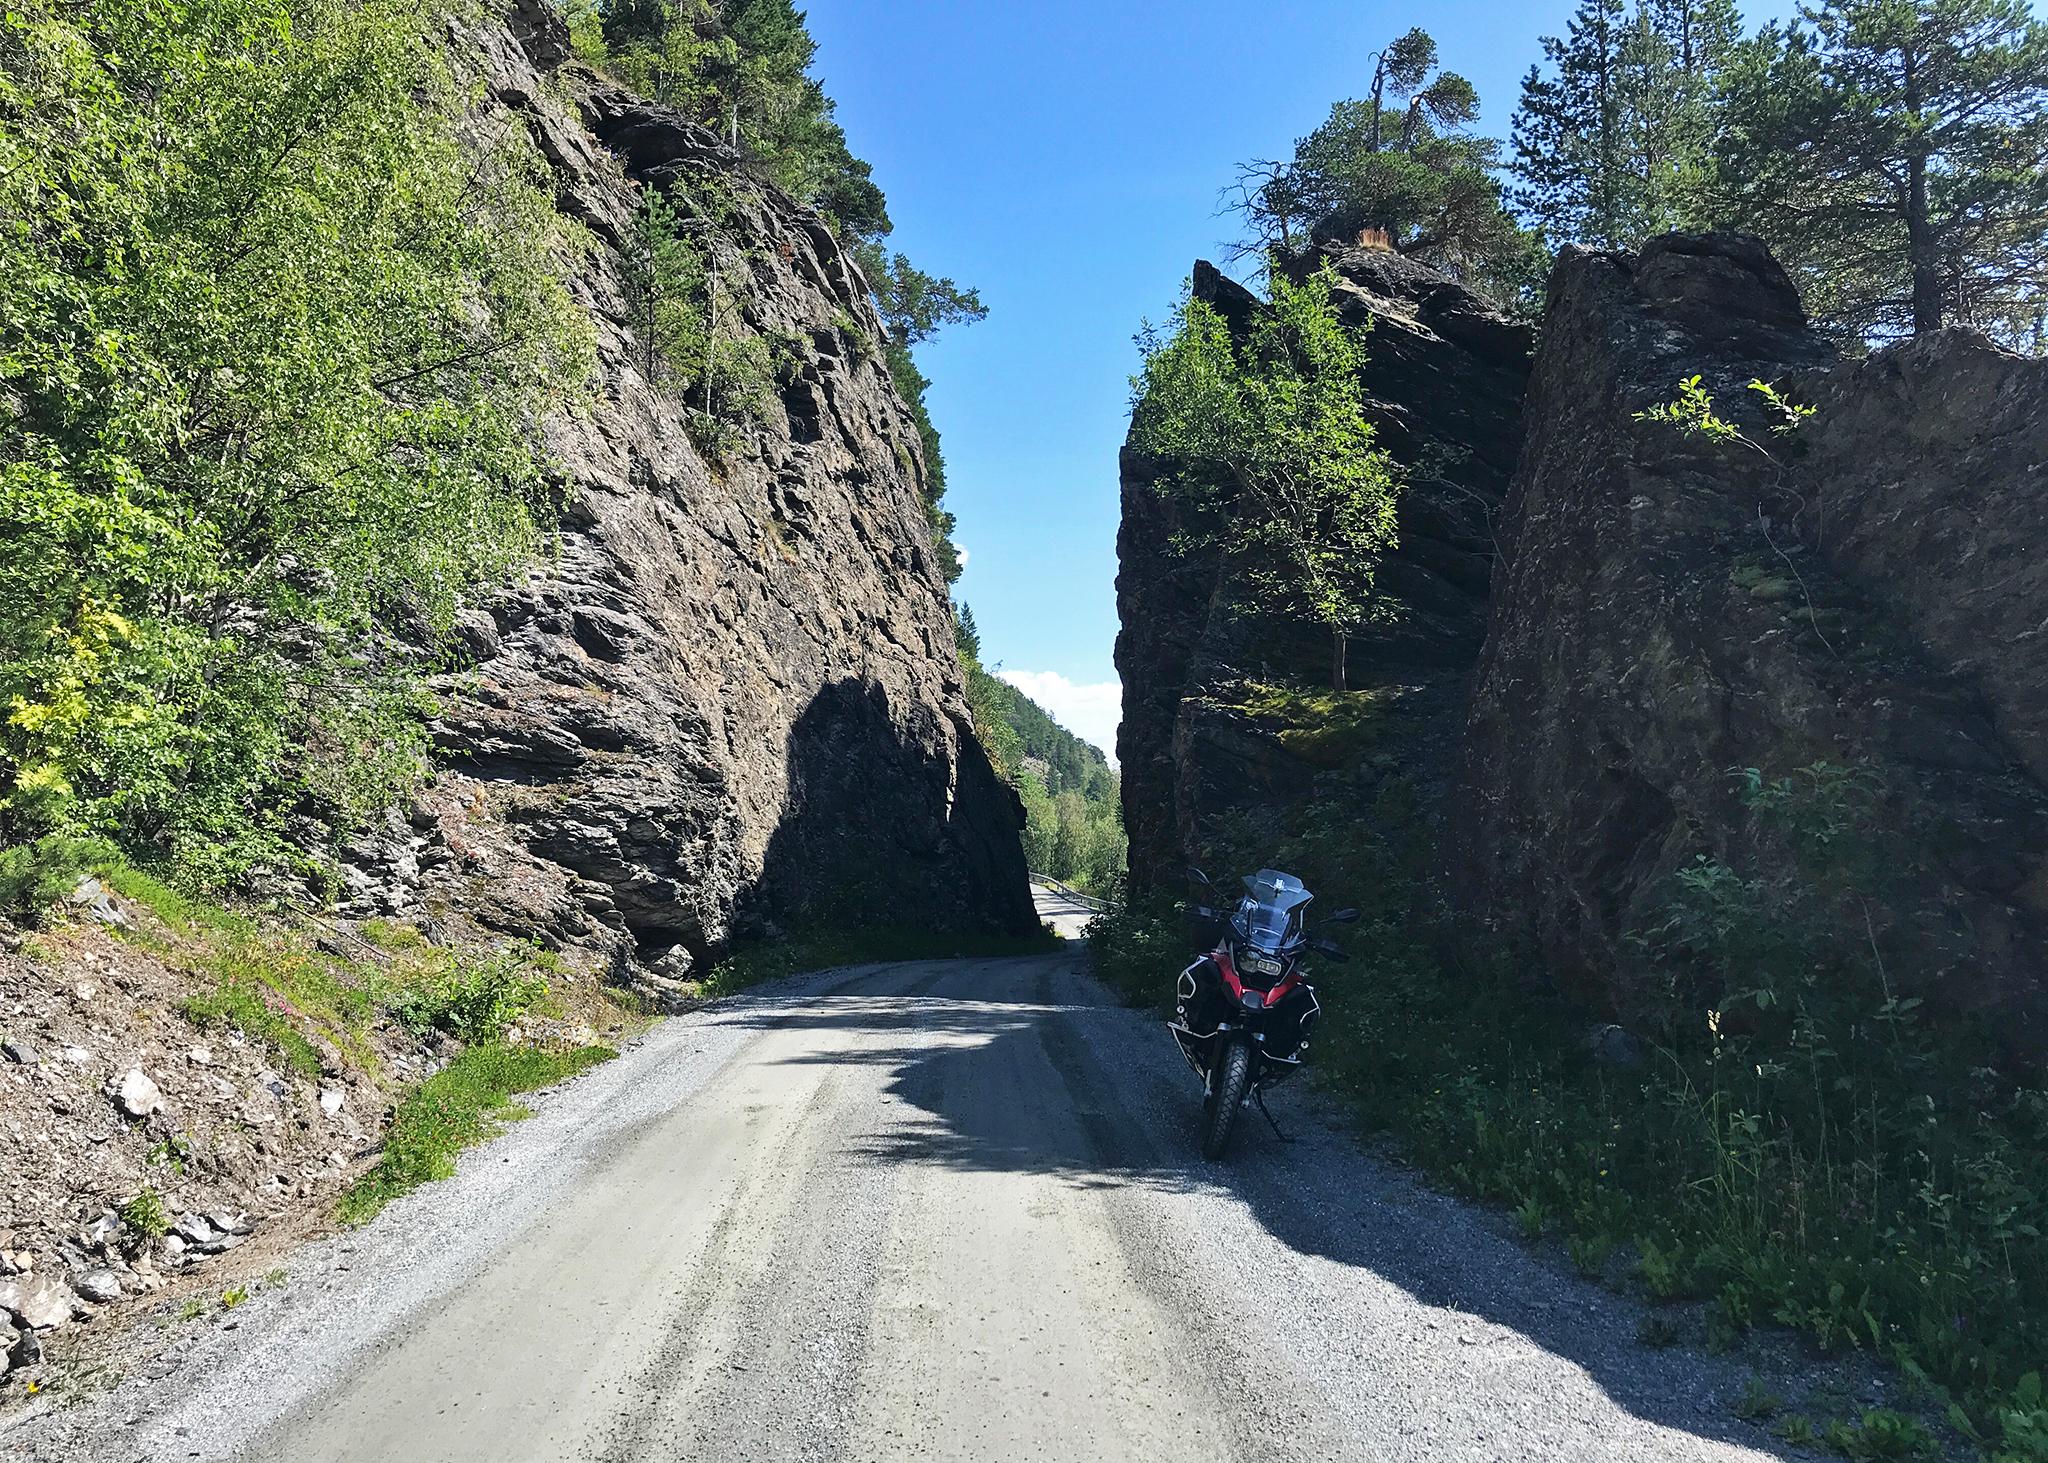 Jotunheimen next: along Vennisvegen in Valdres